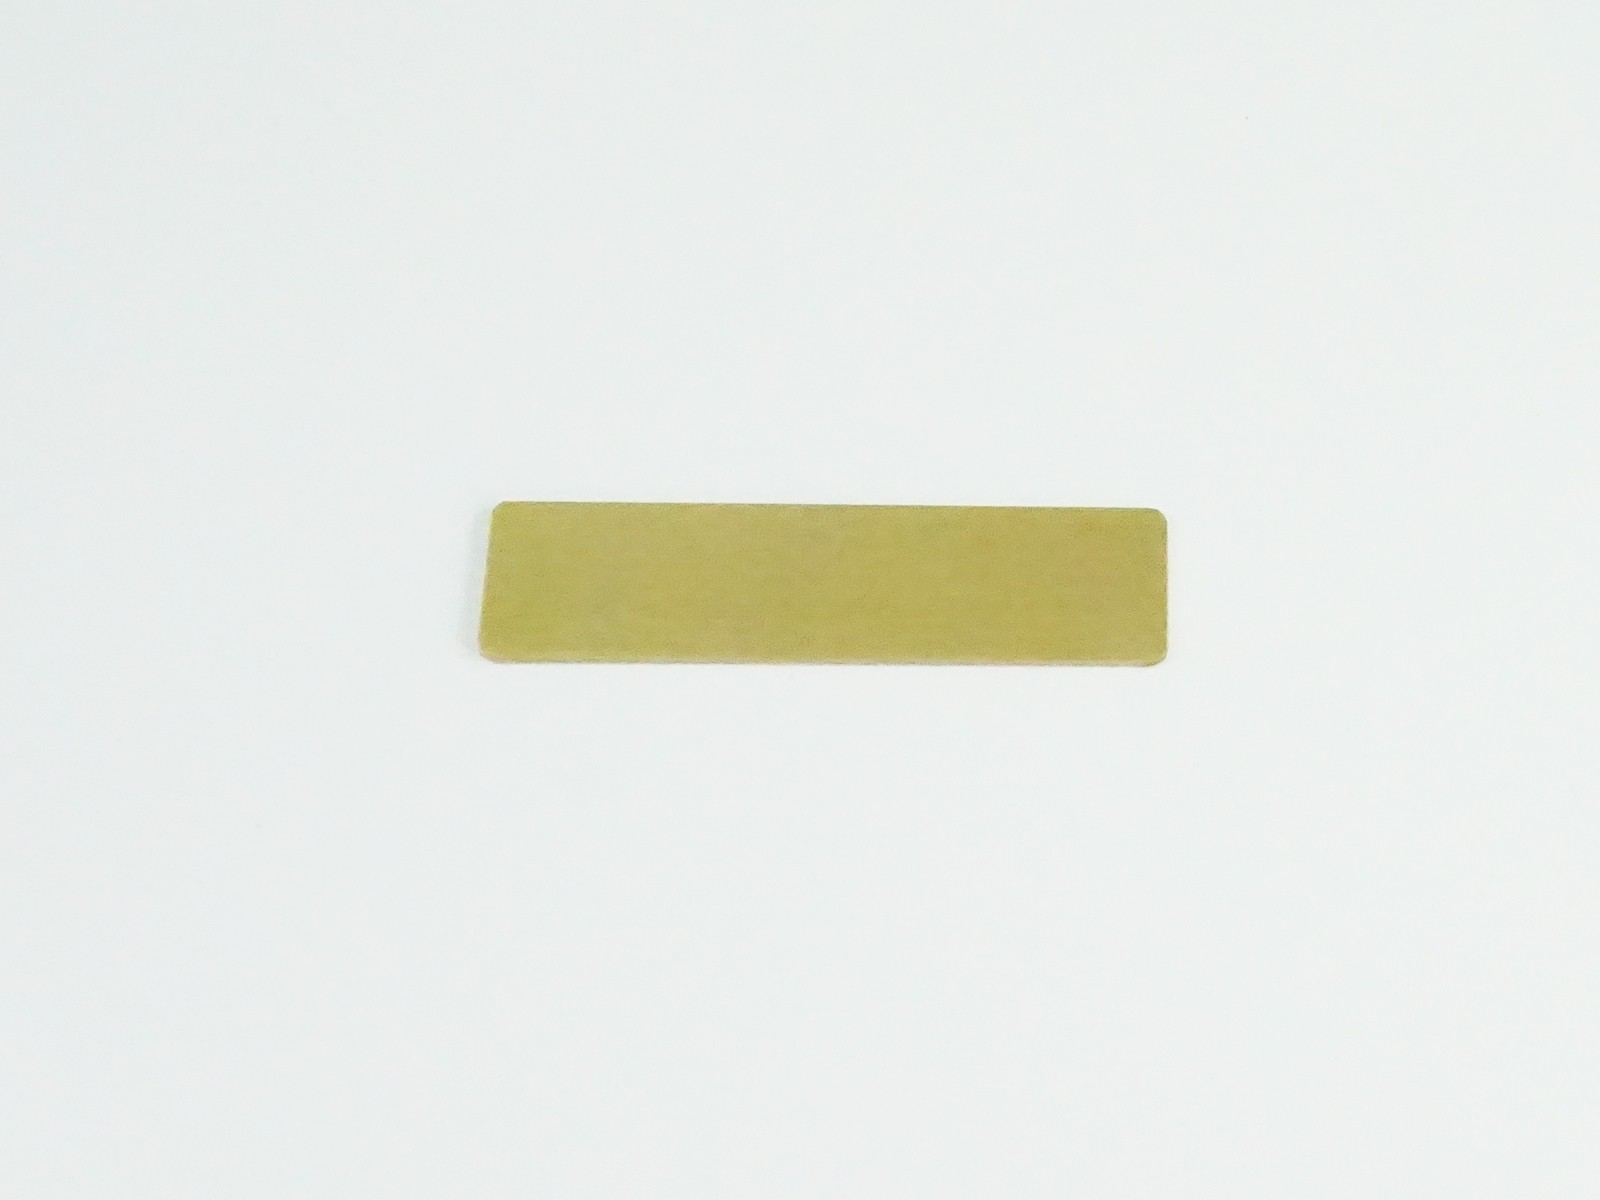 "5/8"" x 2 1/2"" Bright Gold Badge Blank Back"